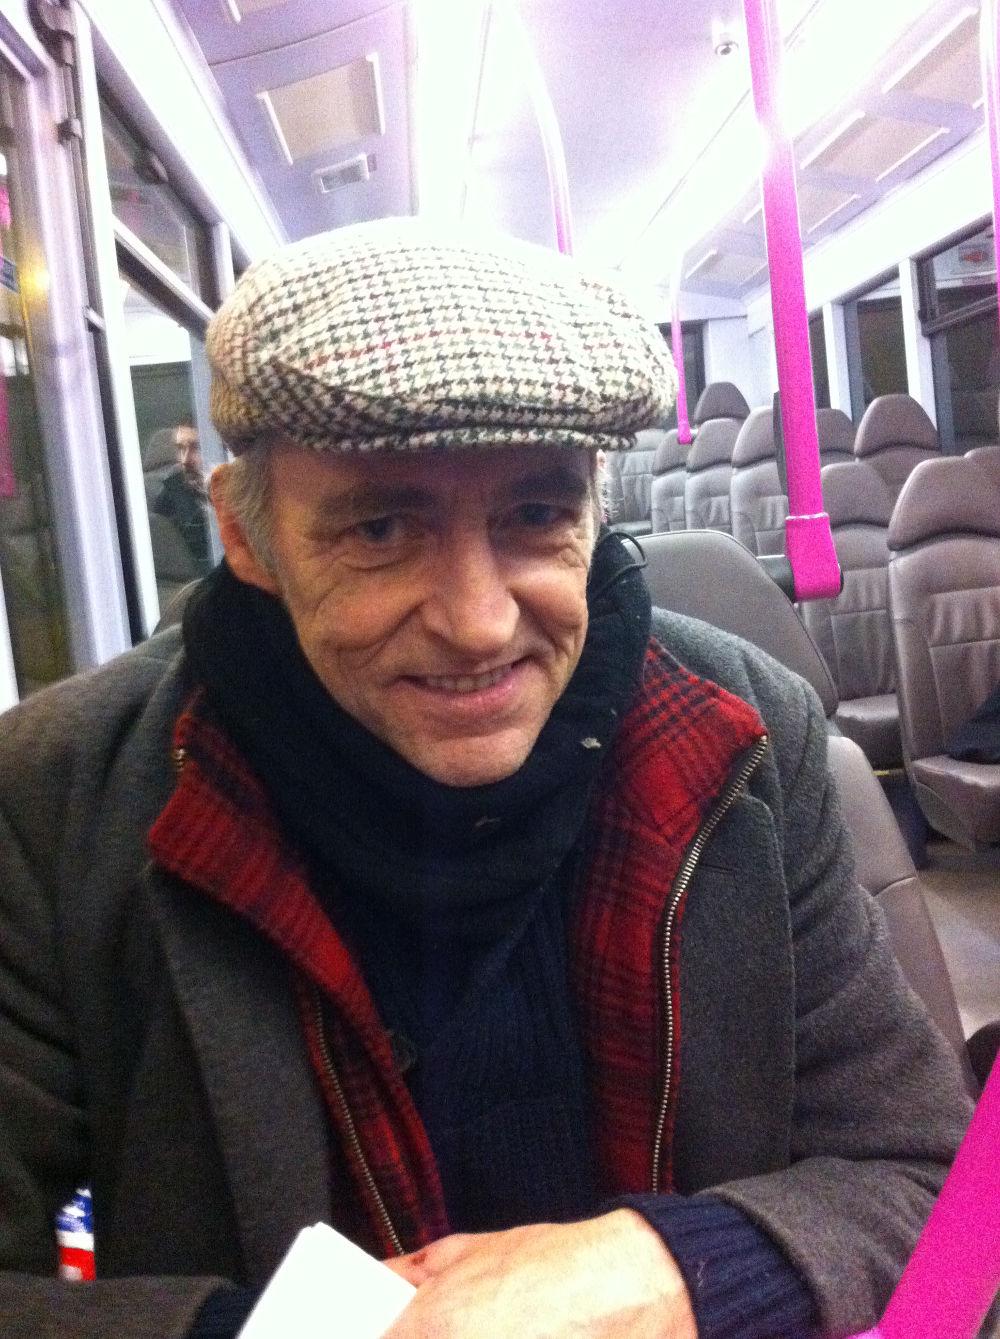 Sean on the bus